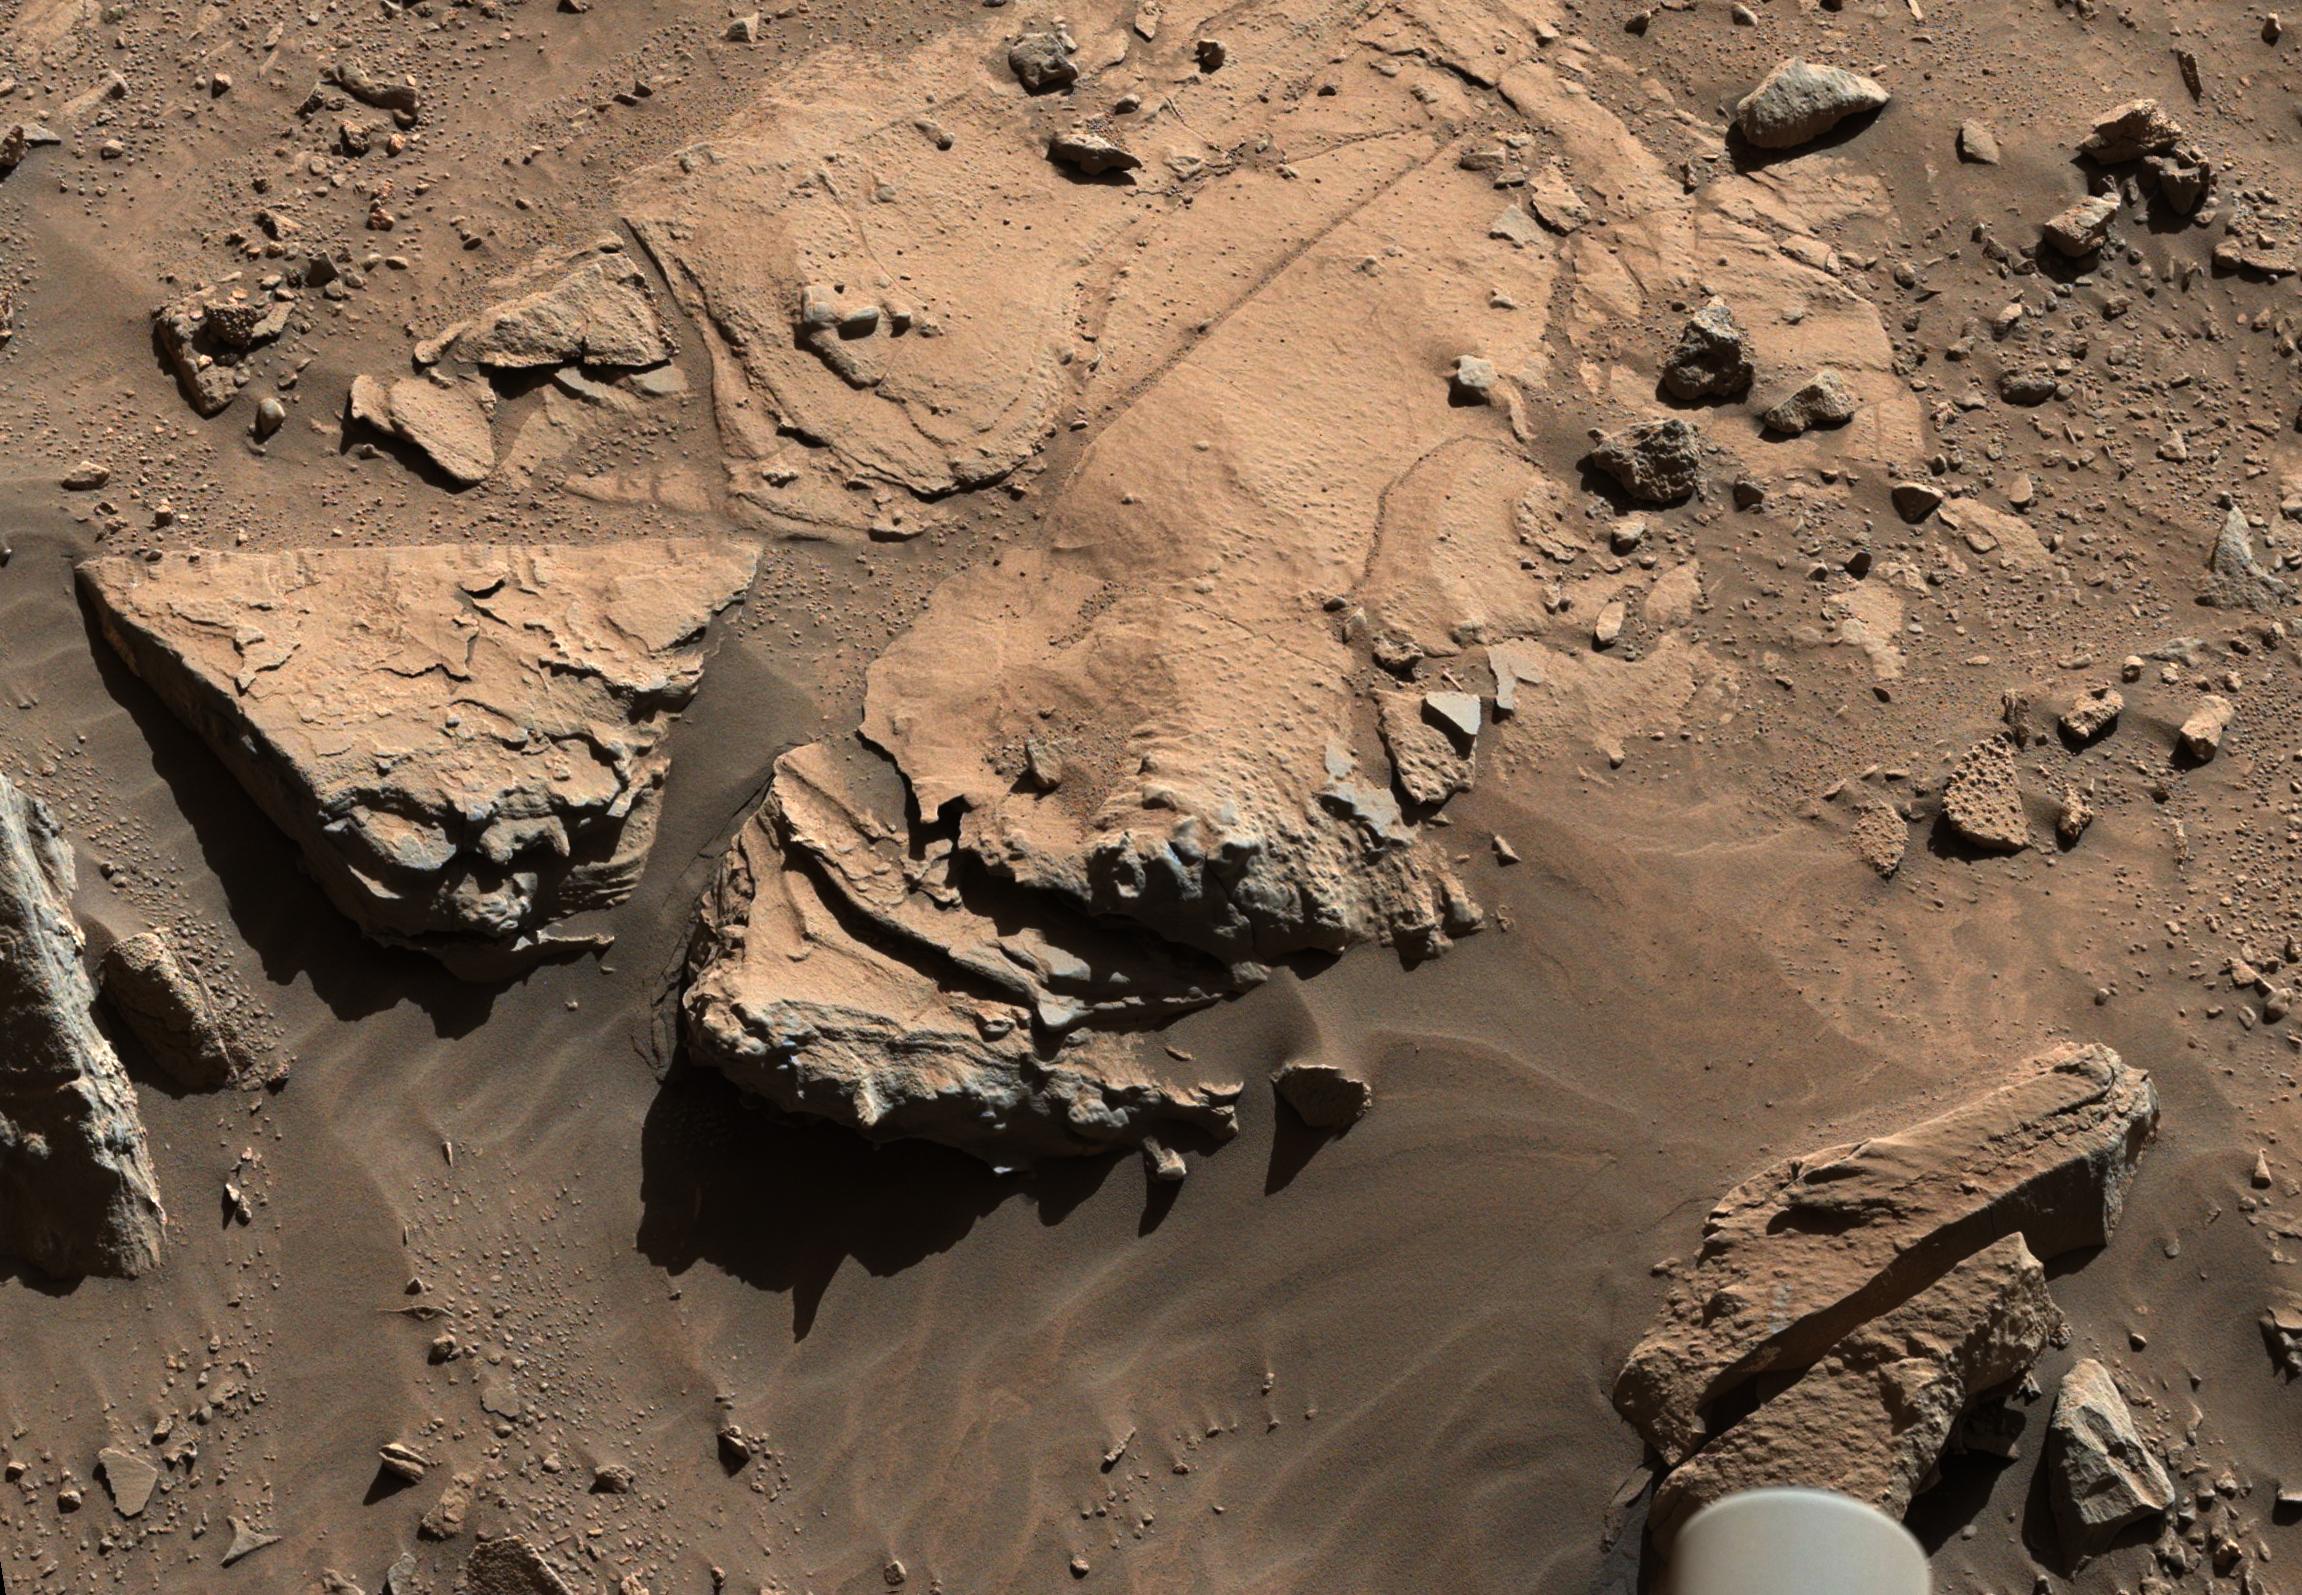 Drill Here? NASA's Curiosity Mars Rover Inspects Site | NASA